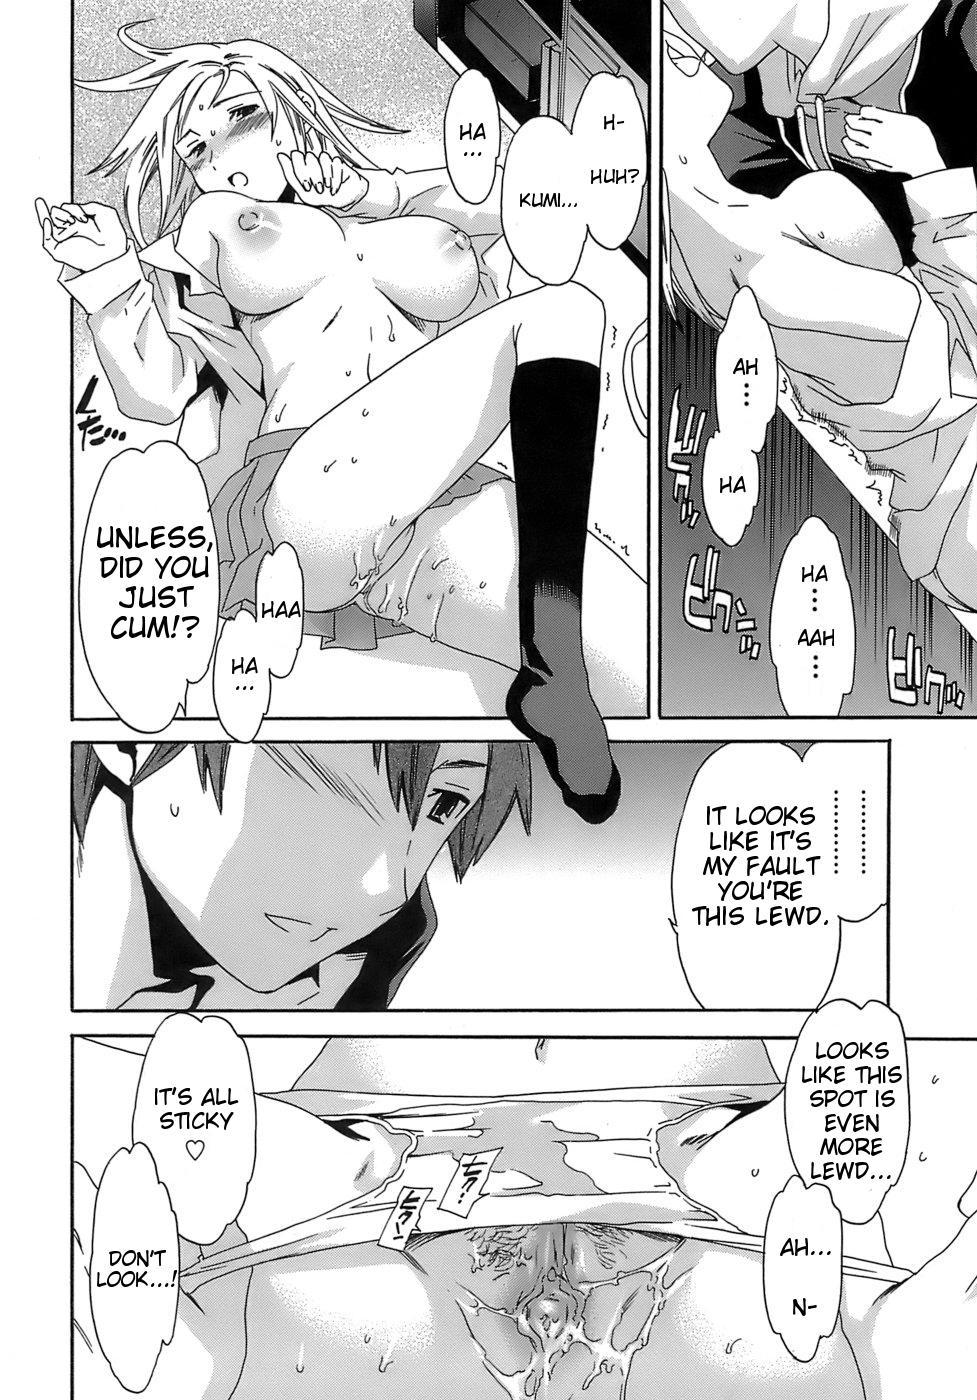 Juicy chapter 6 - shy shy girl 7